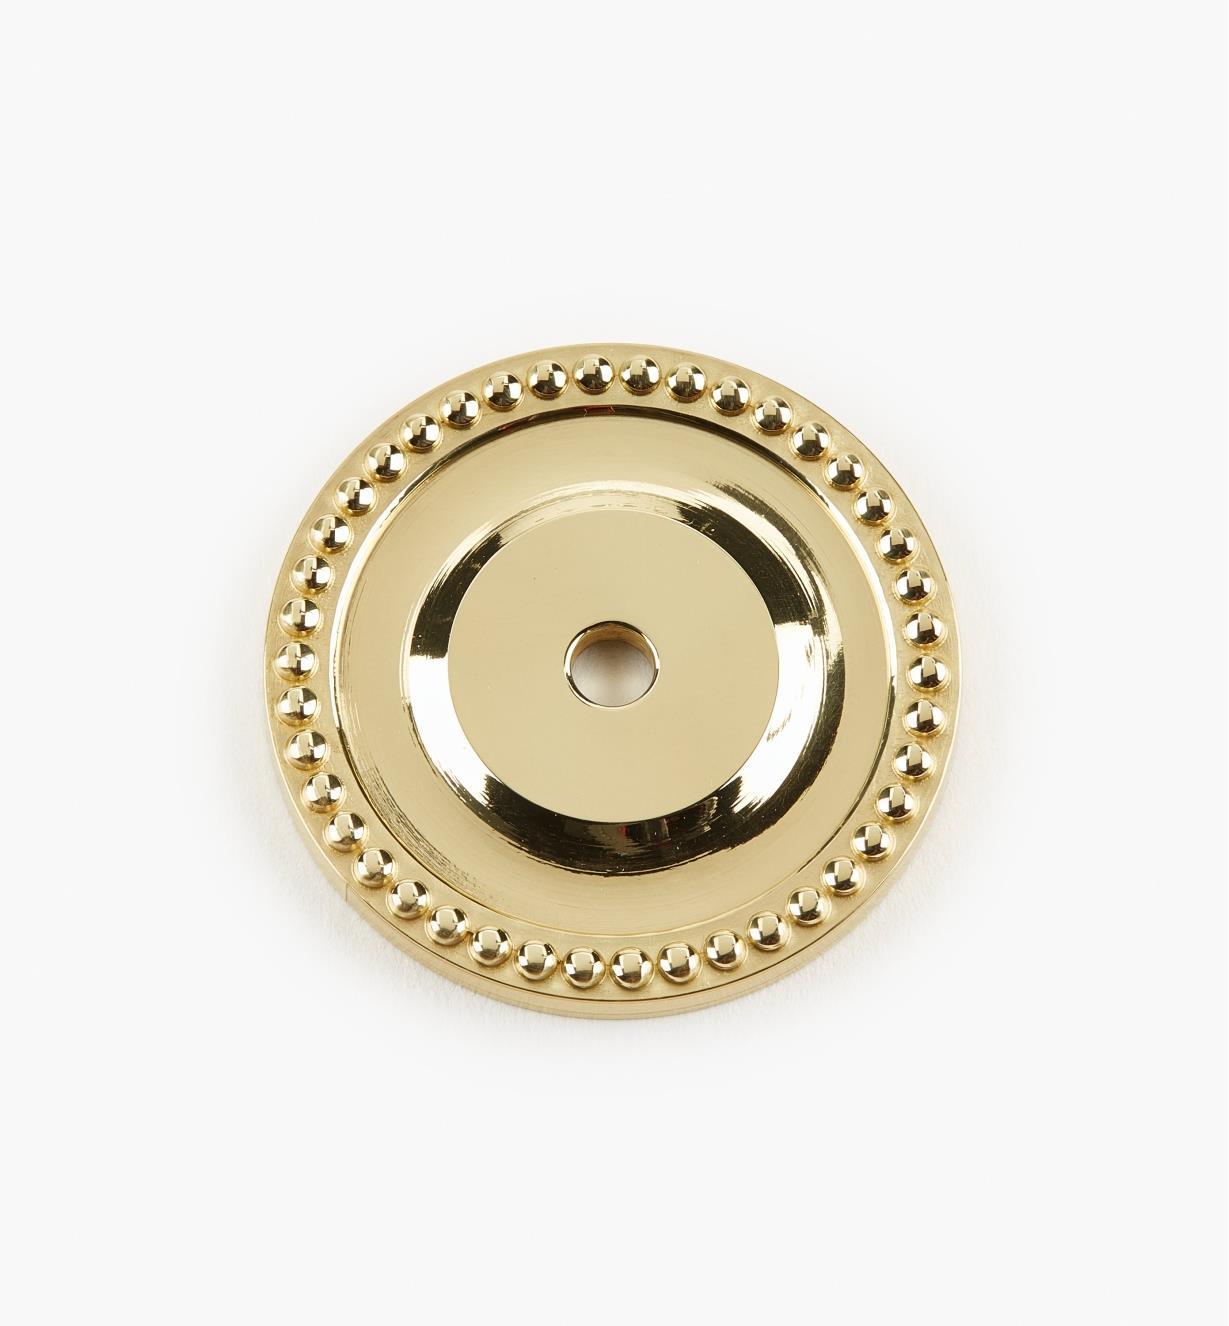 00W2070 - Platine ronde perlée pour bouton, 41mm